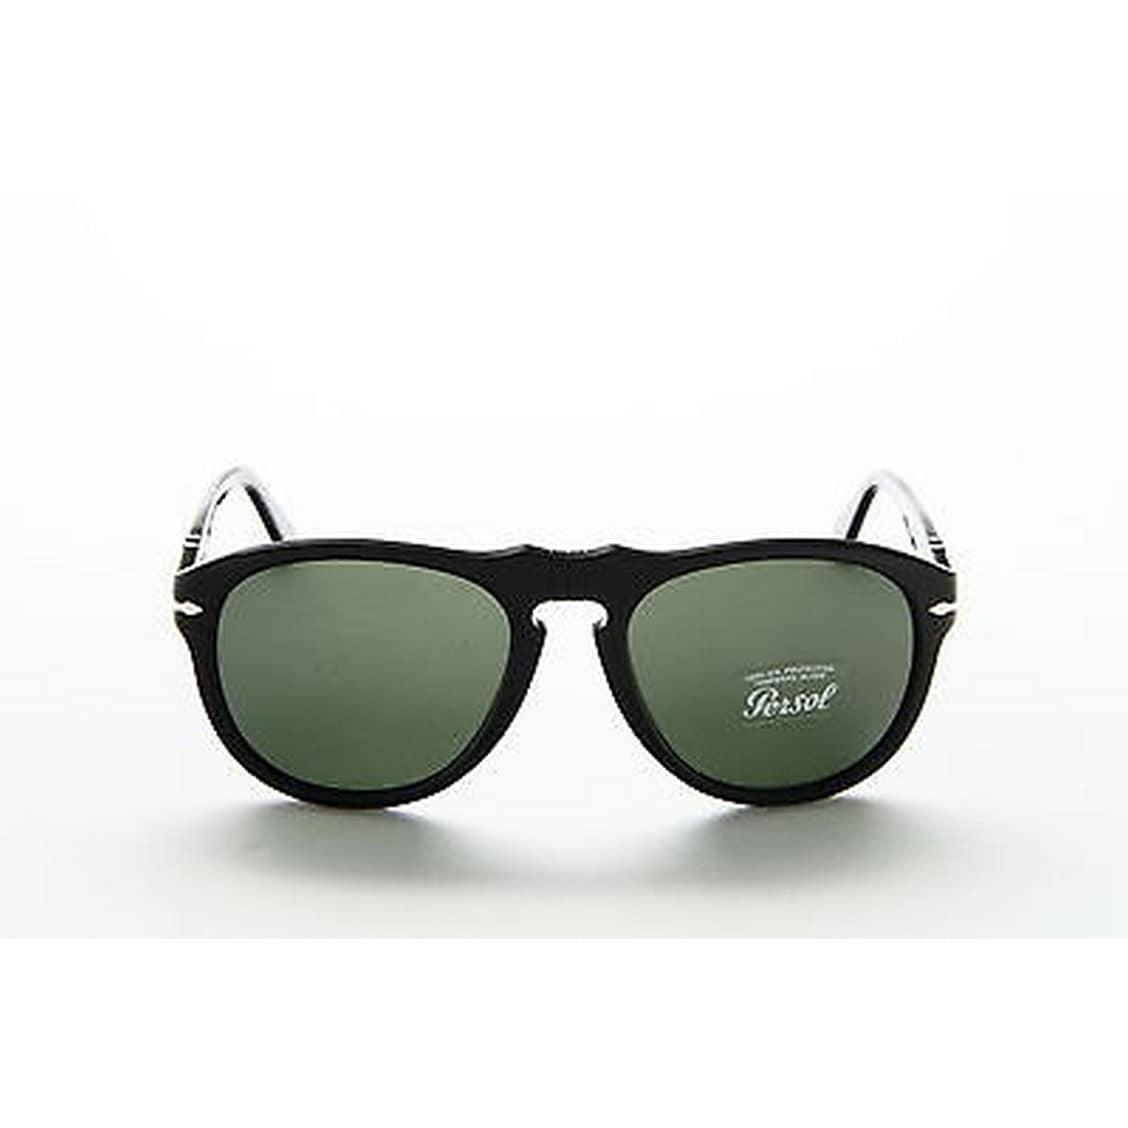 bafda3808e Shop Persol Men s PO0649 95 31 56 Aviator Plastic Black Green Sunglasses -  Free Shipping Today - Overstock.com - 14602167